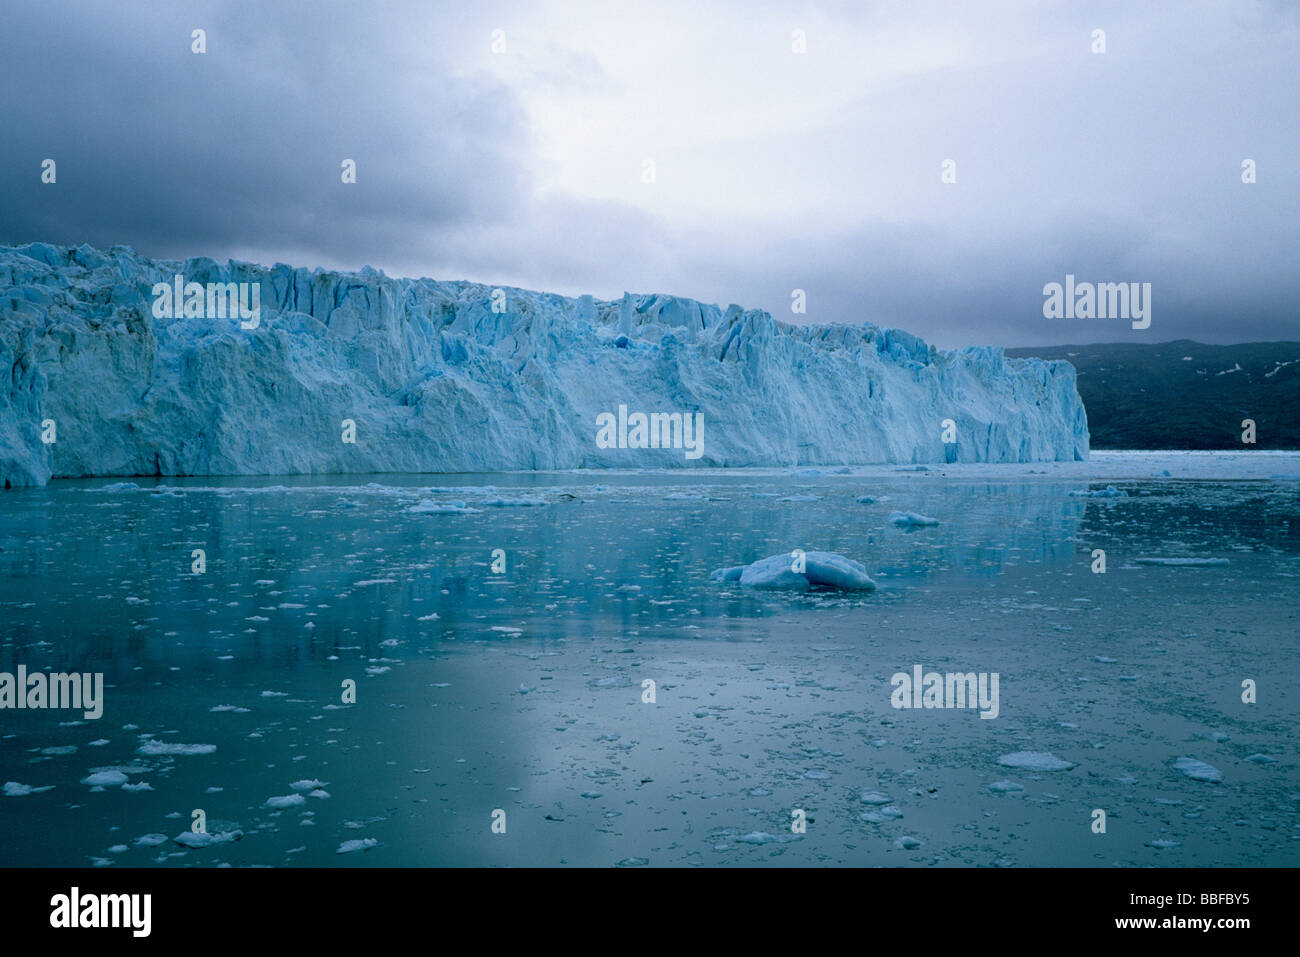 Equip Sermia Glacier, West Greenland, in bad Weather Stock Photo